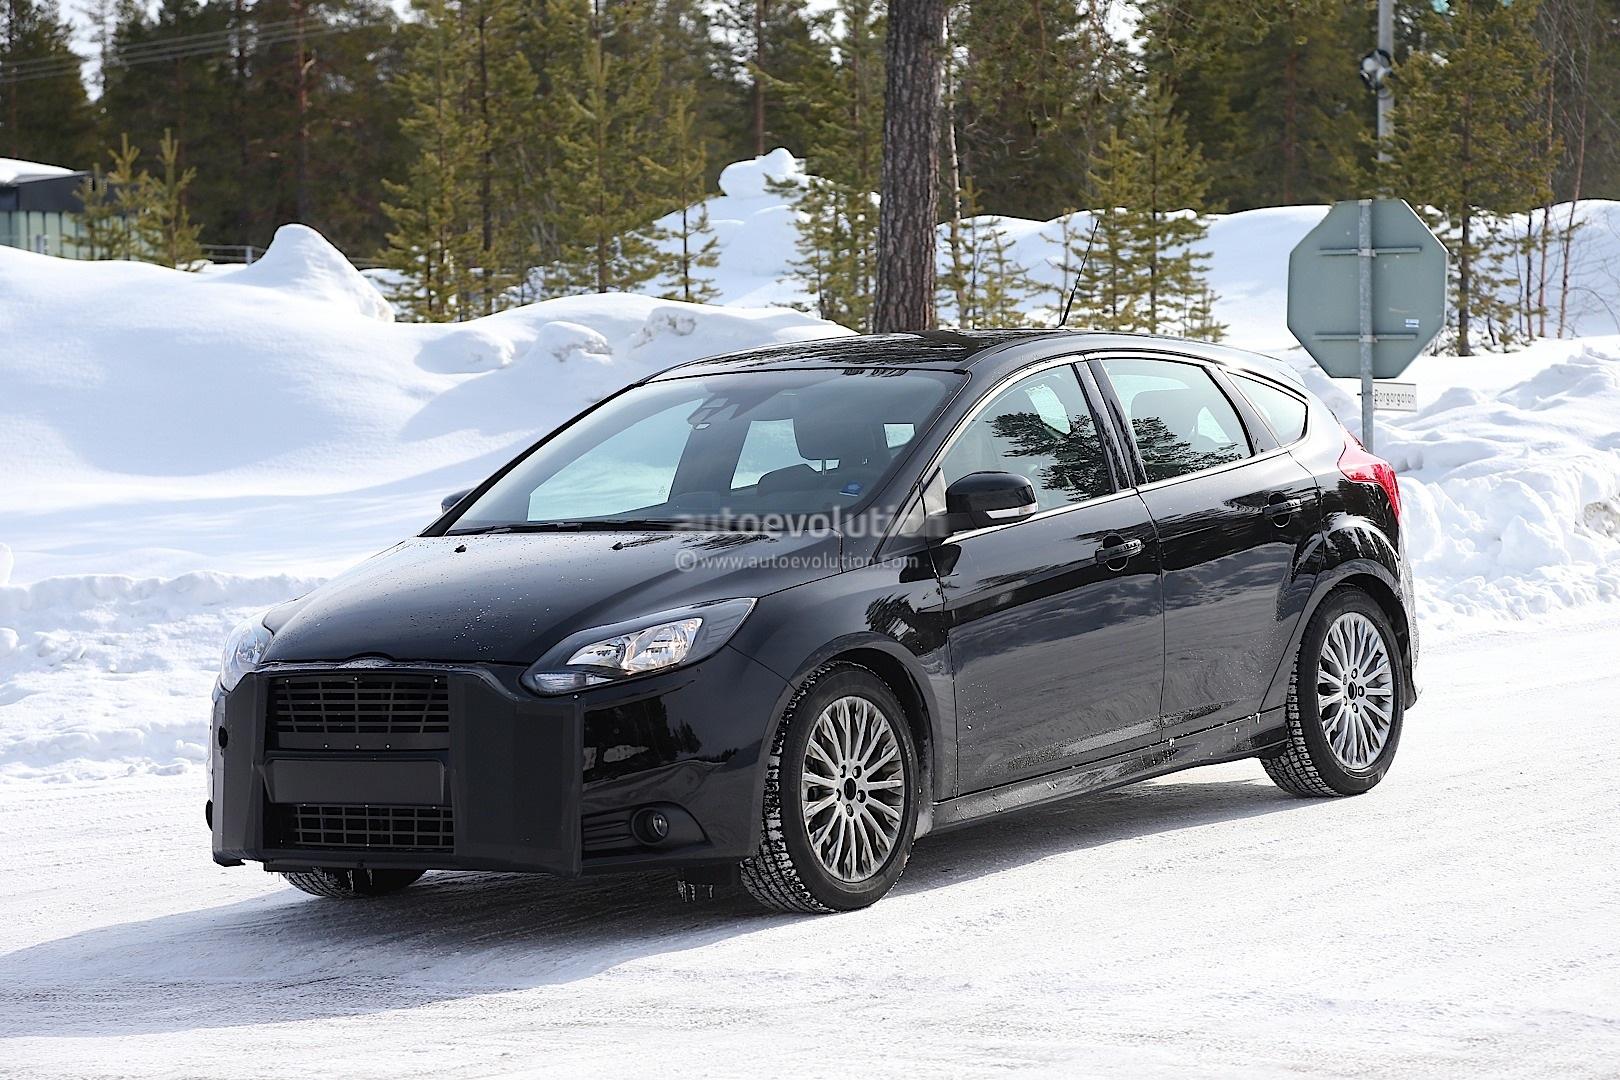 Spyshots: 2015 Ford Focus RS - autoevolution